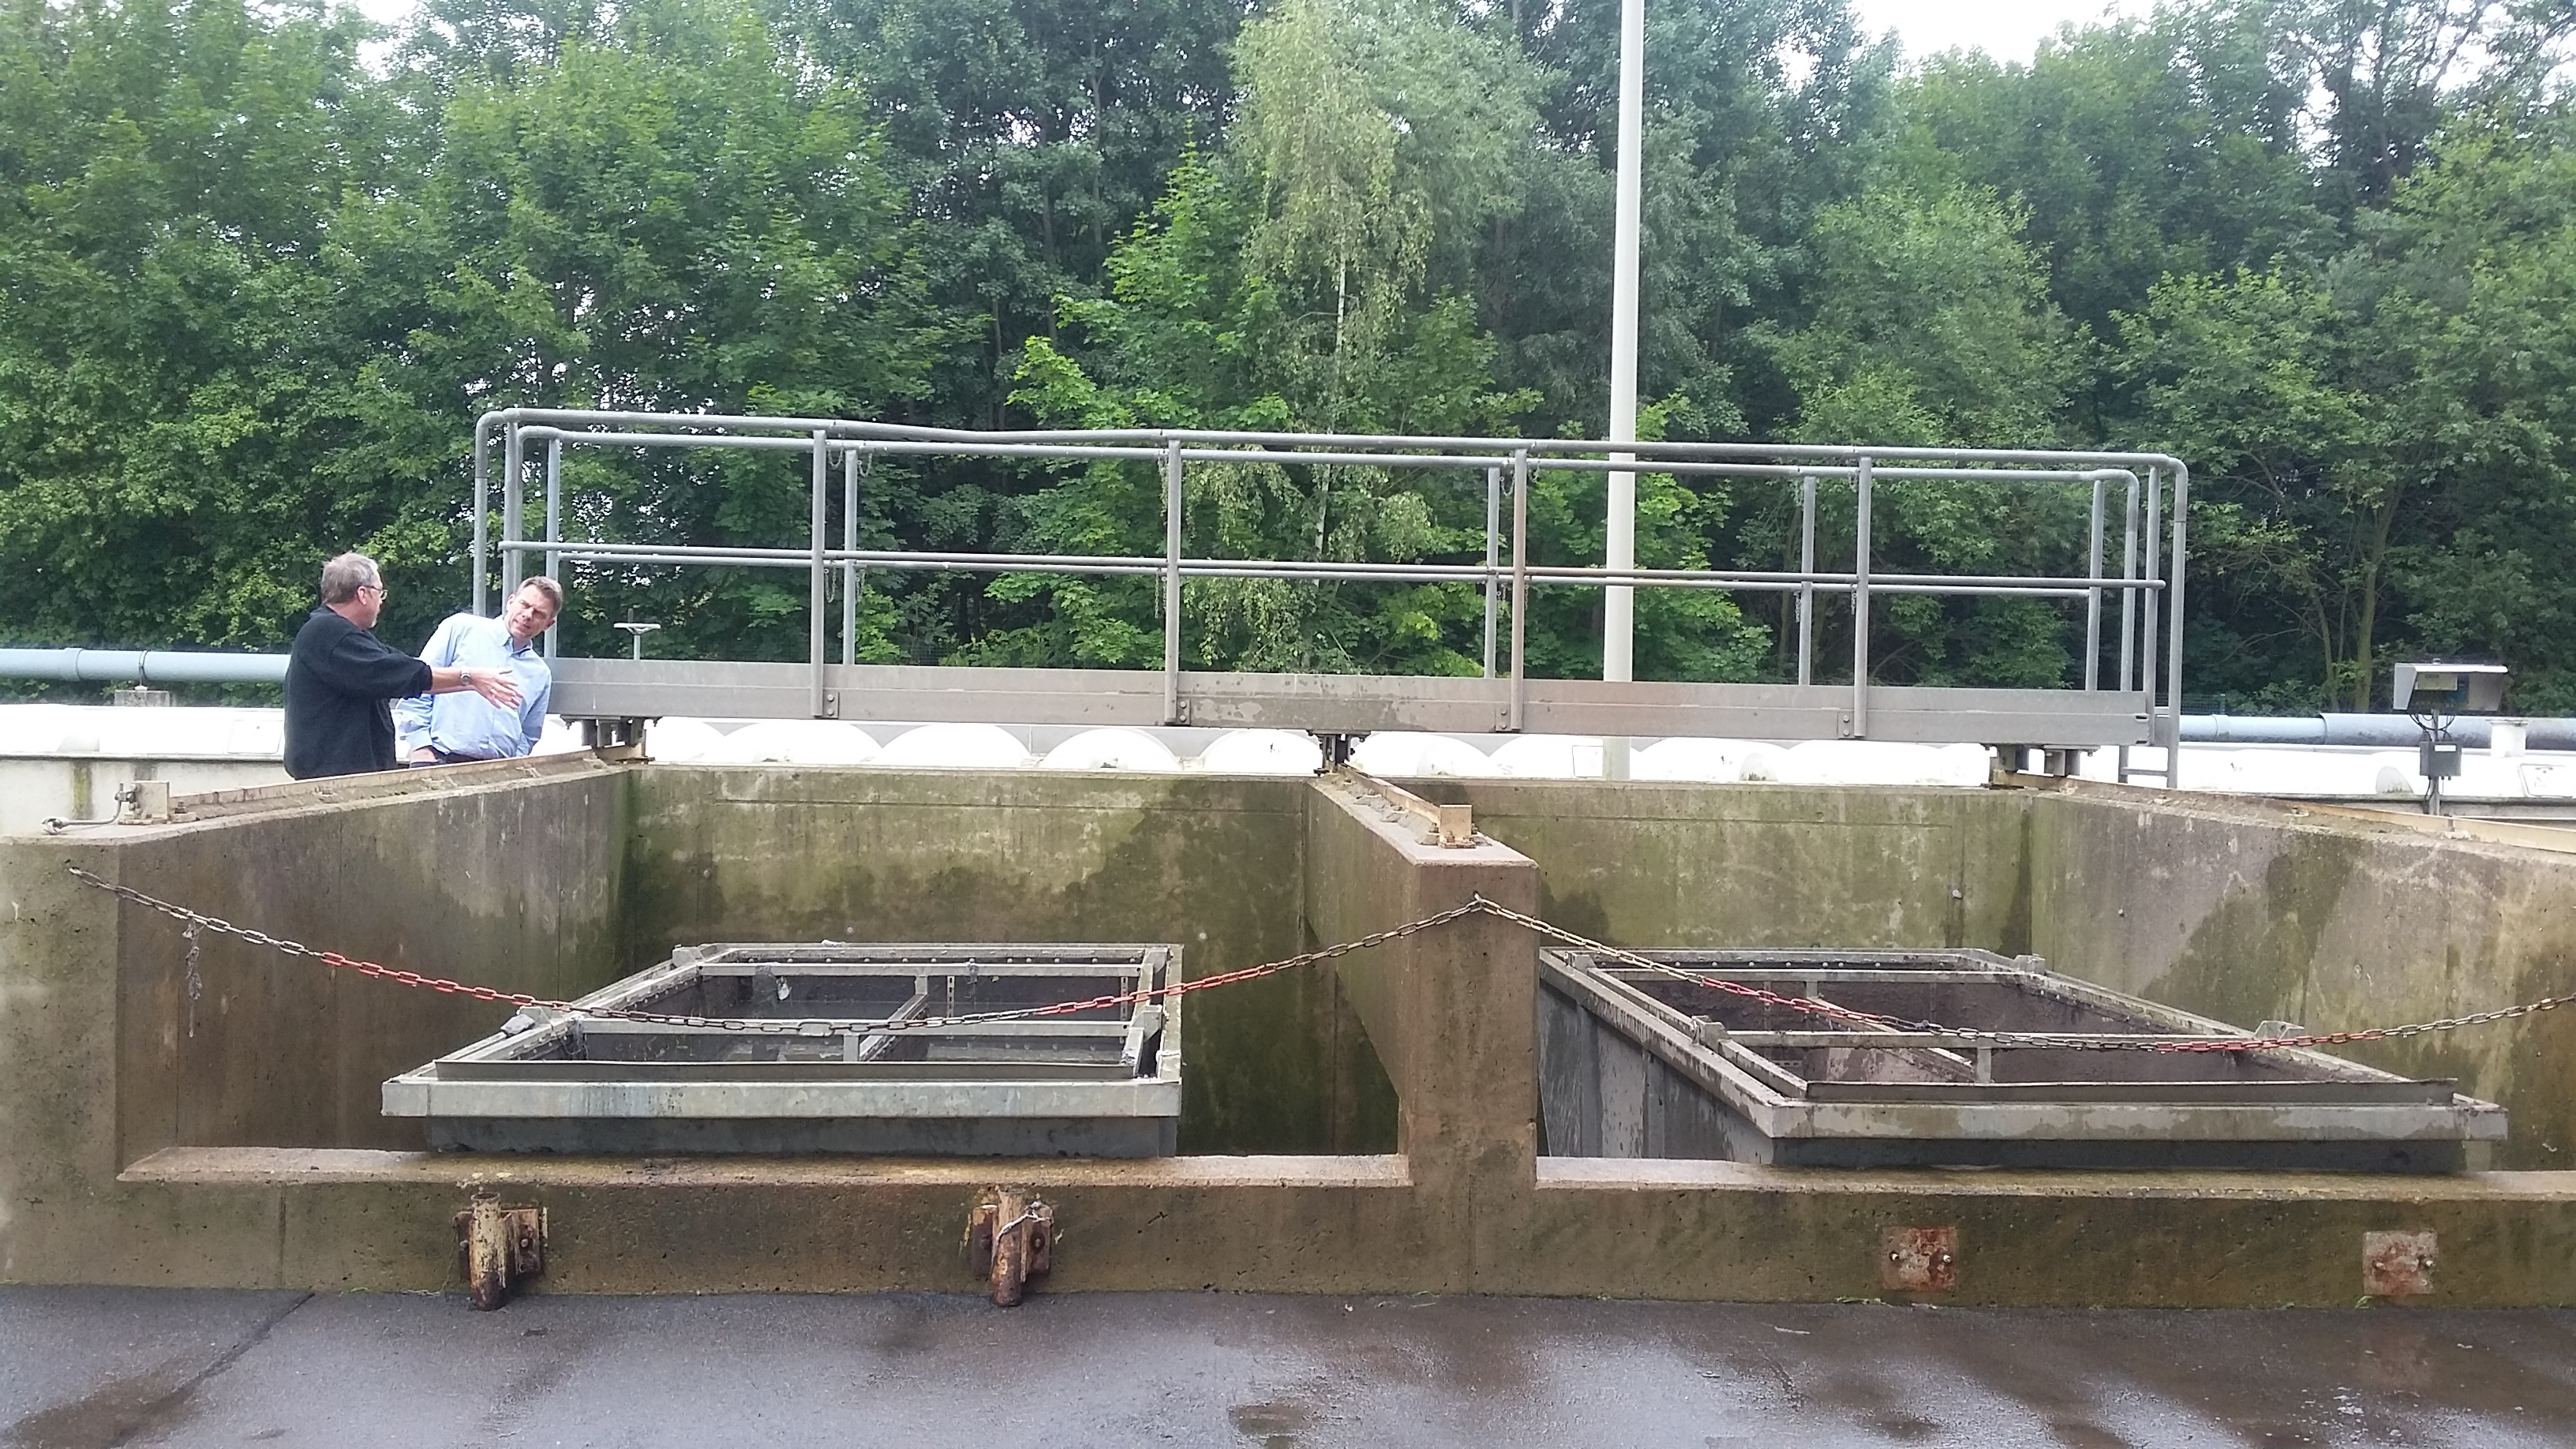 Kanalspülgut und Bohrschlämme entwässern